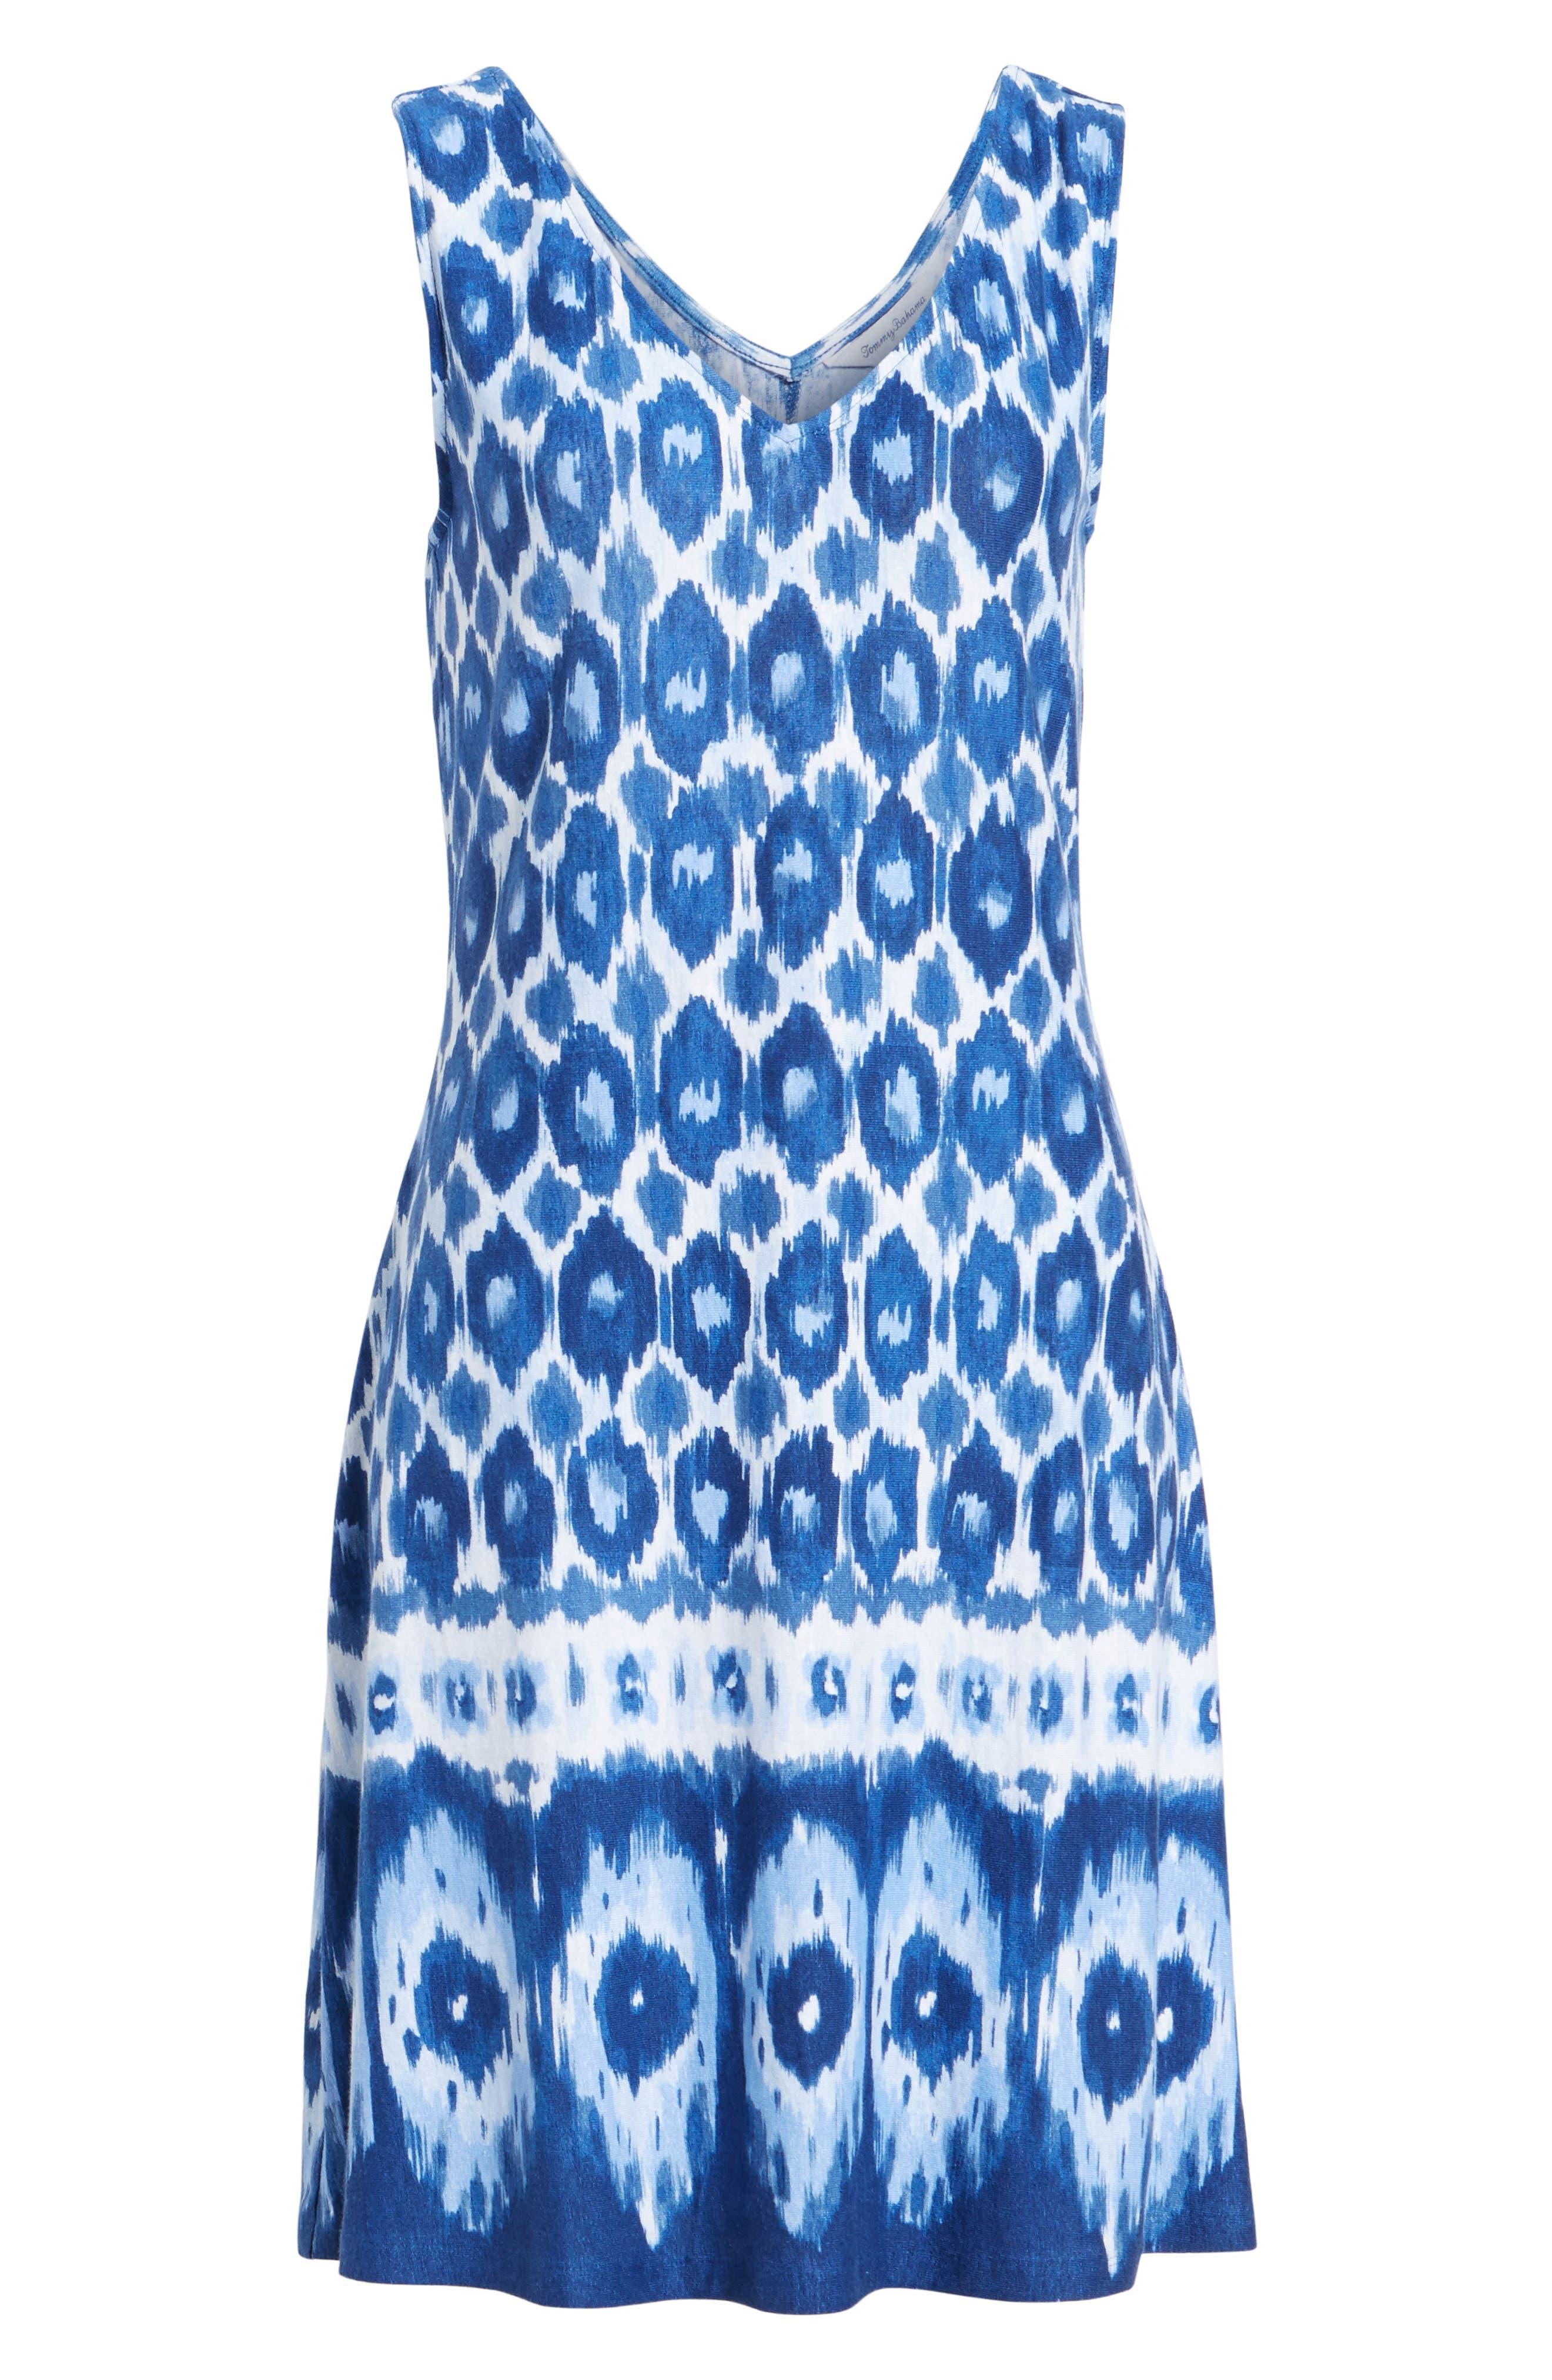 Innercoastal Ikat Sleeveless Dress,                             Alternate thumbnail 6, color,                             KINGDOM BLUE